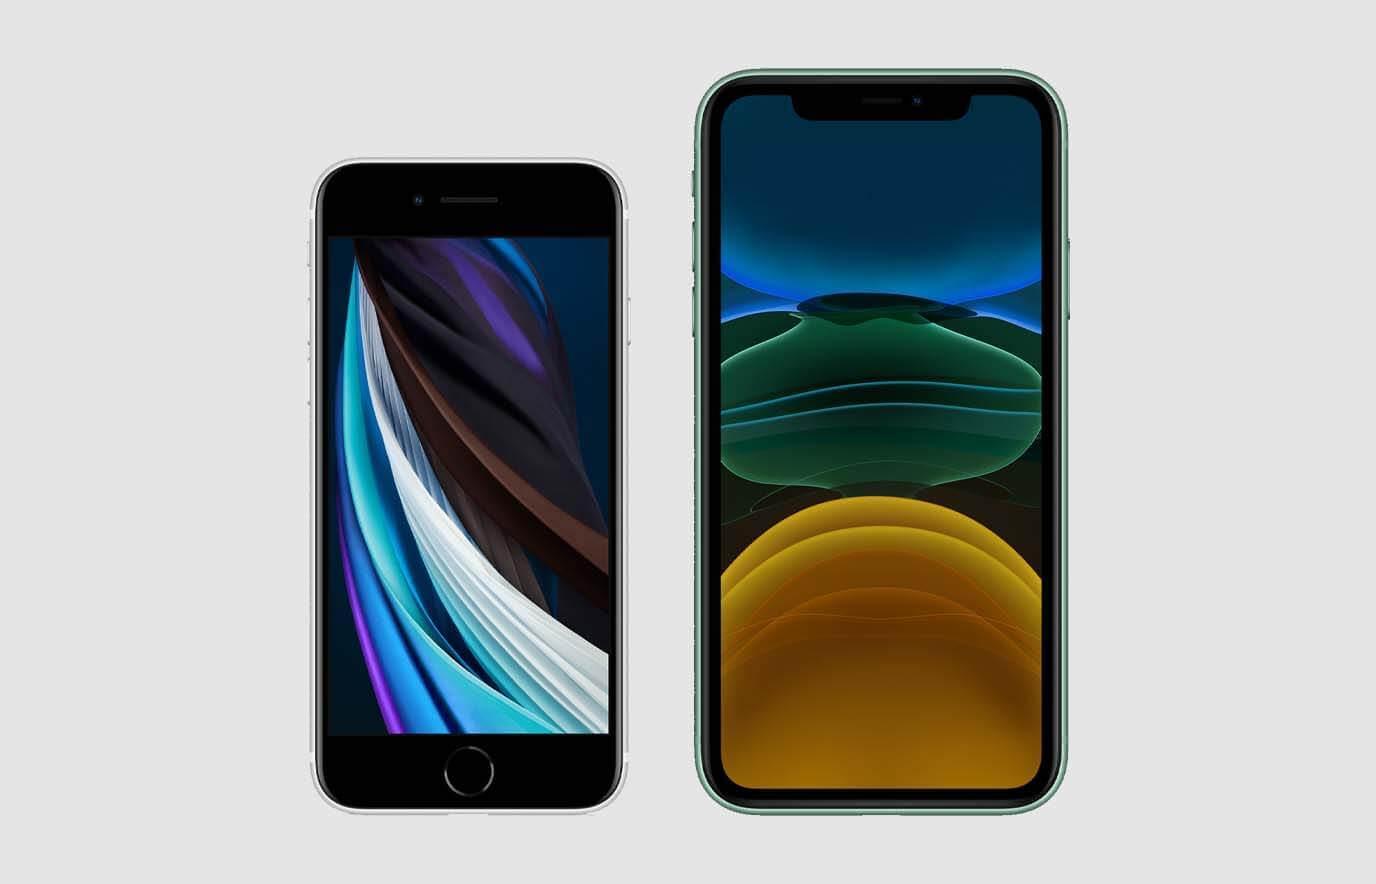 iPhone SE 2020 vs iPhone 11